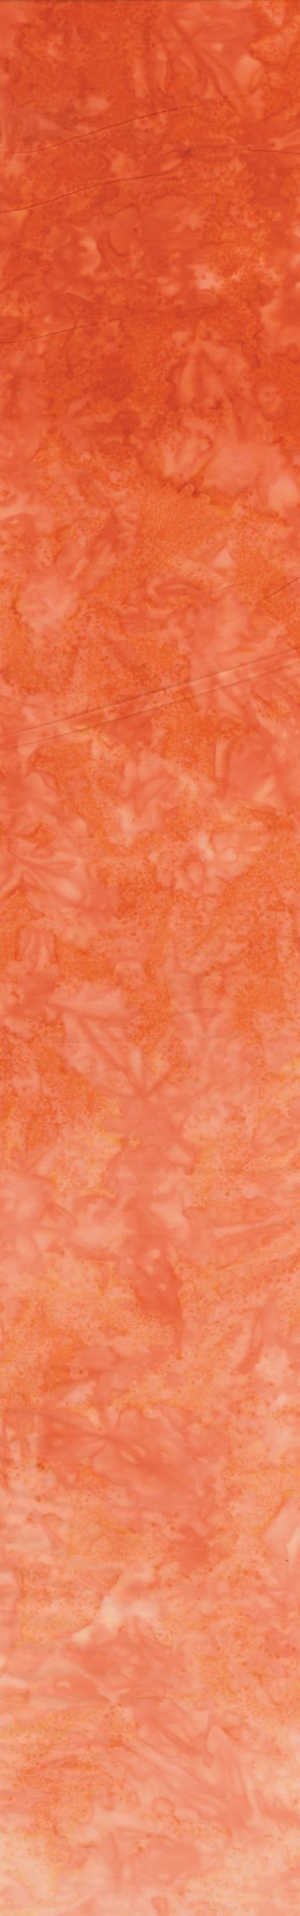 Benartex Bali Batik Gradition gelb-orange